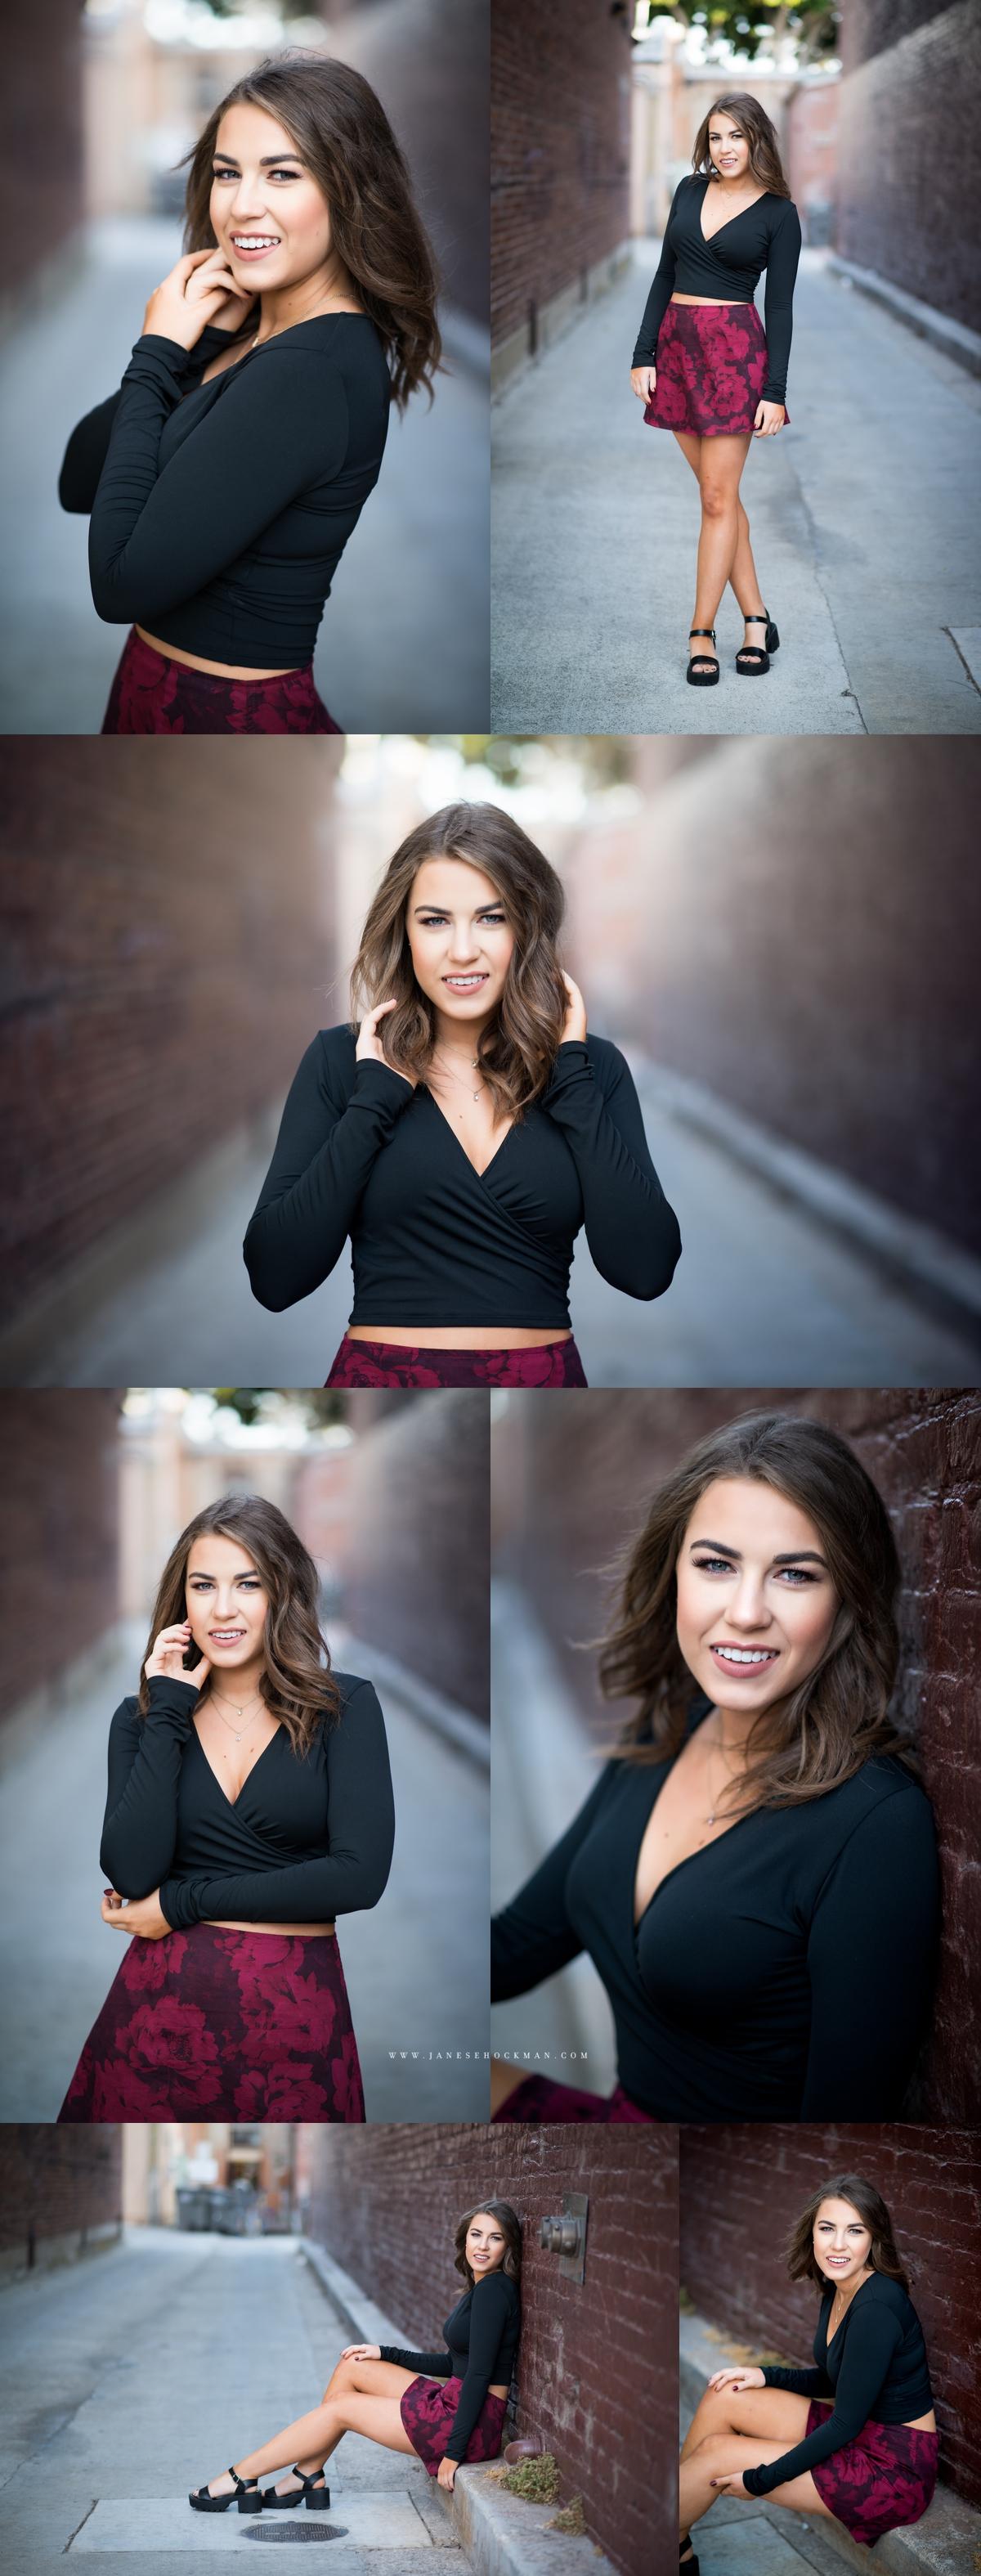 Holly | Janese Hockman Photography San Luis Obispo High School senior portraits California 3.jpg